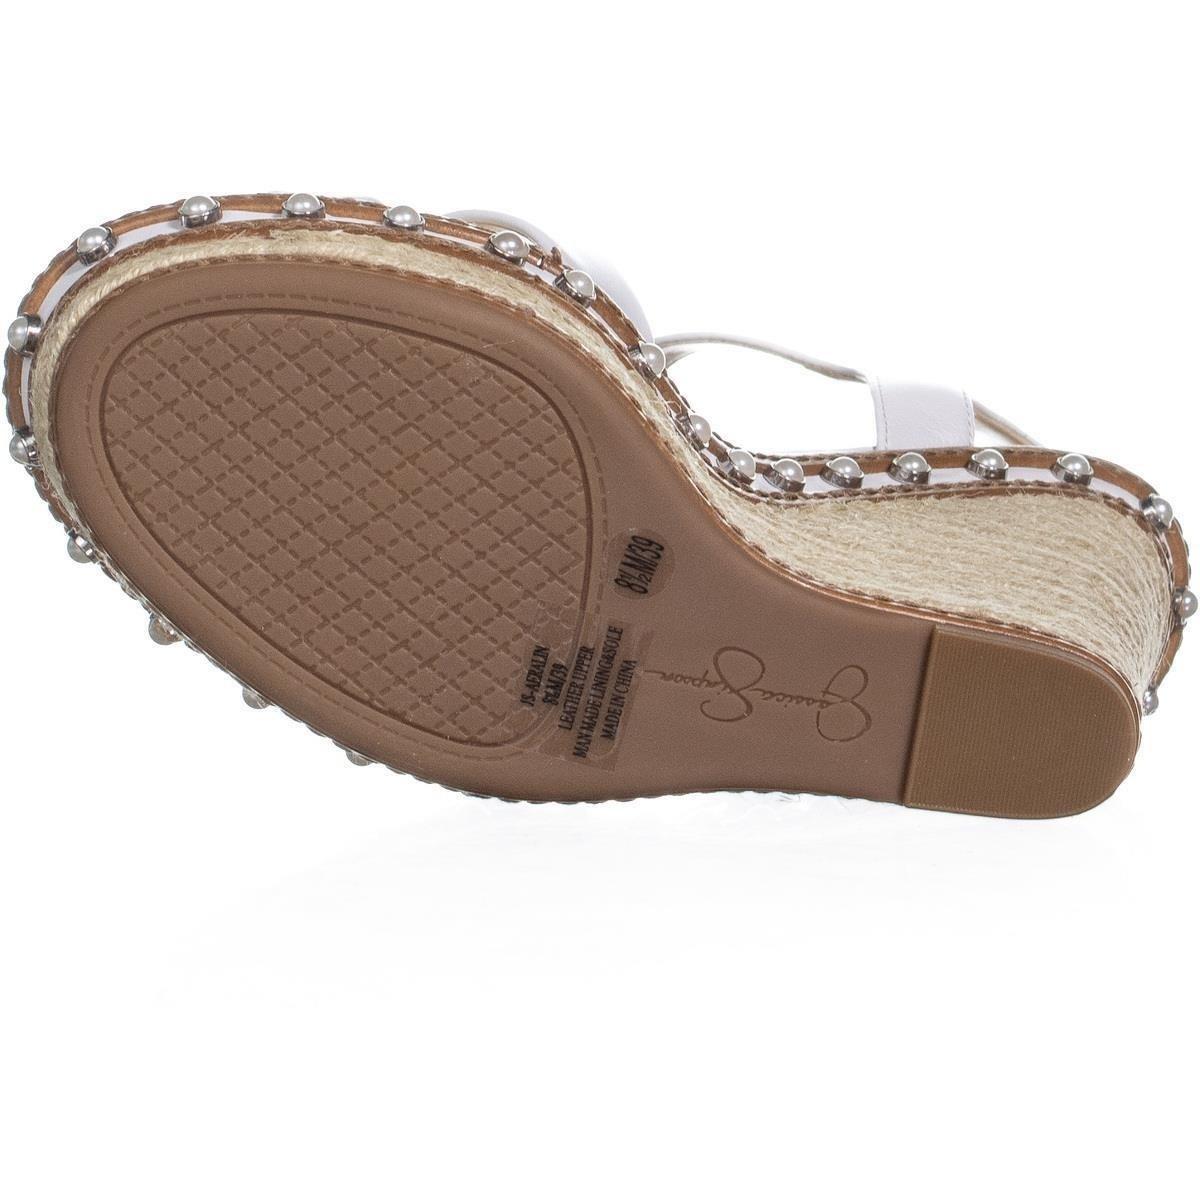 Jessica Simpson Womens Aeralin Leather Open Toe Casual